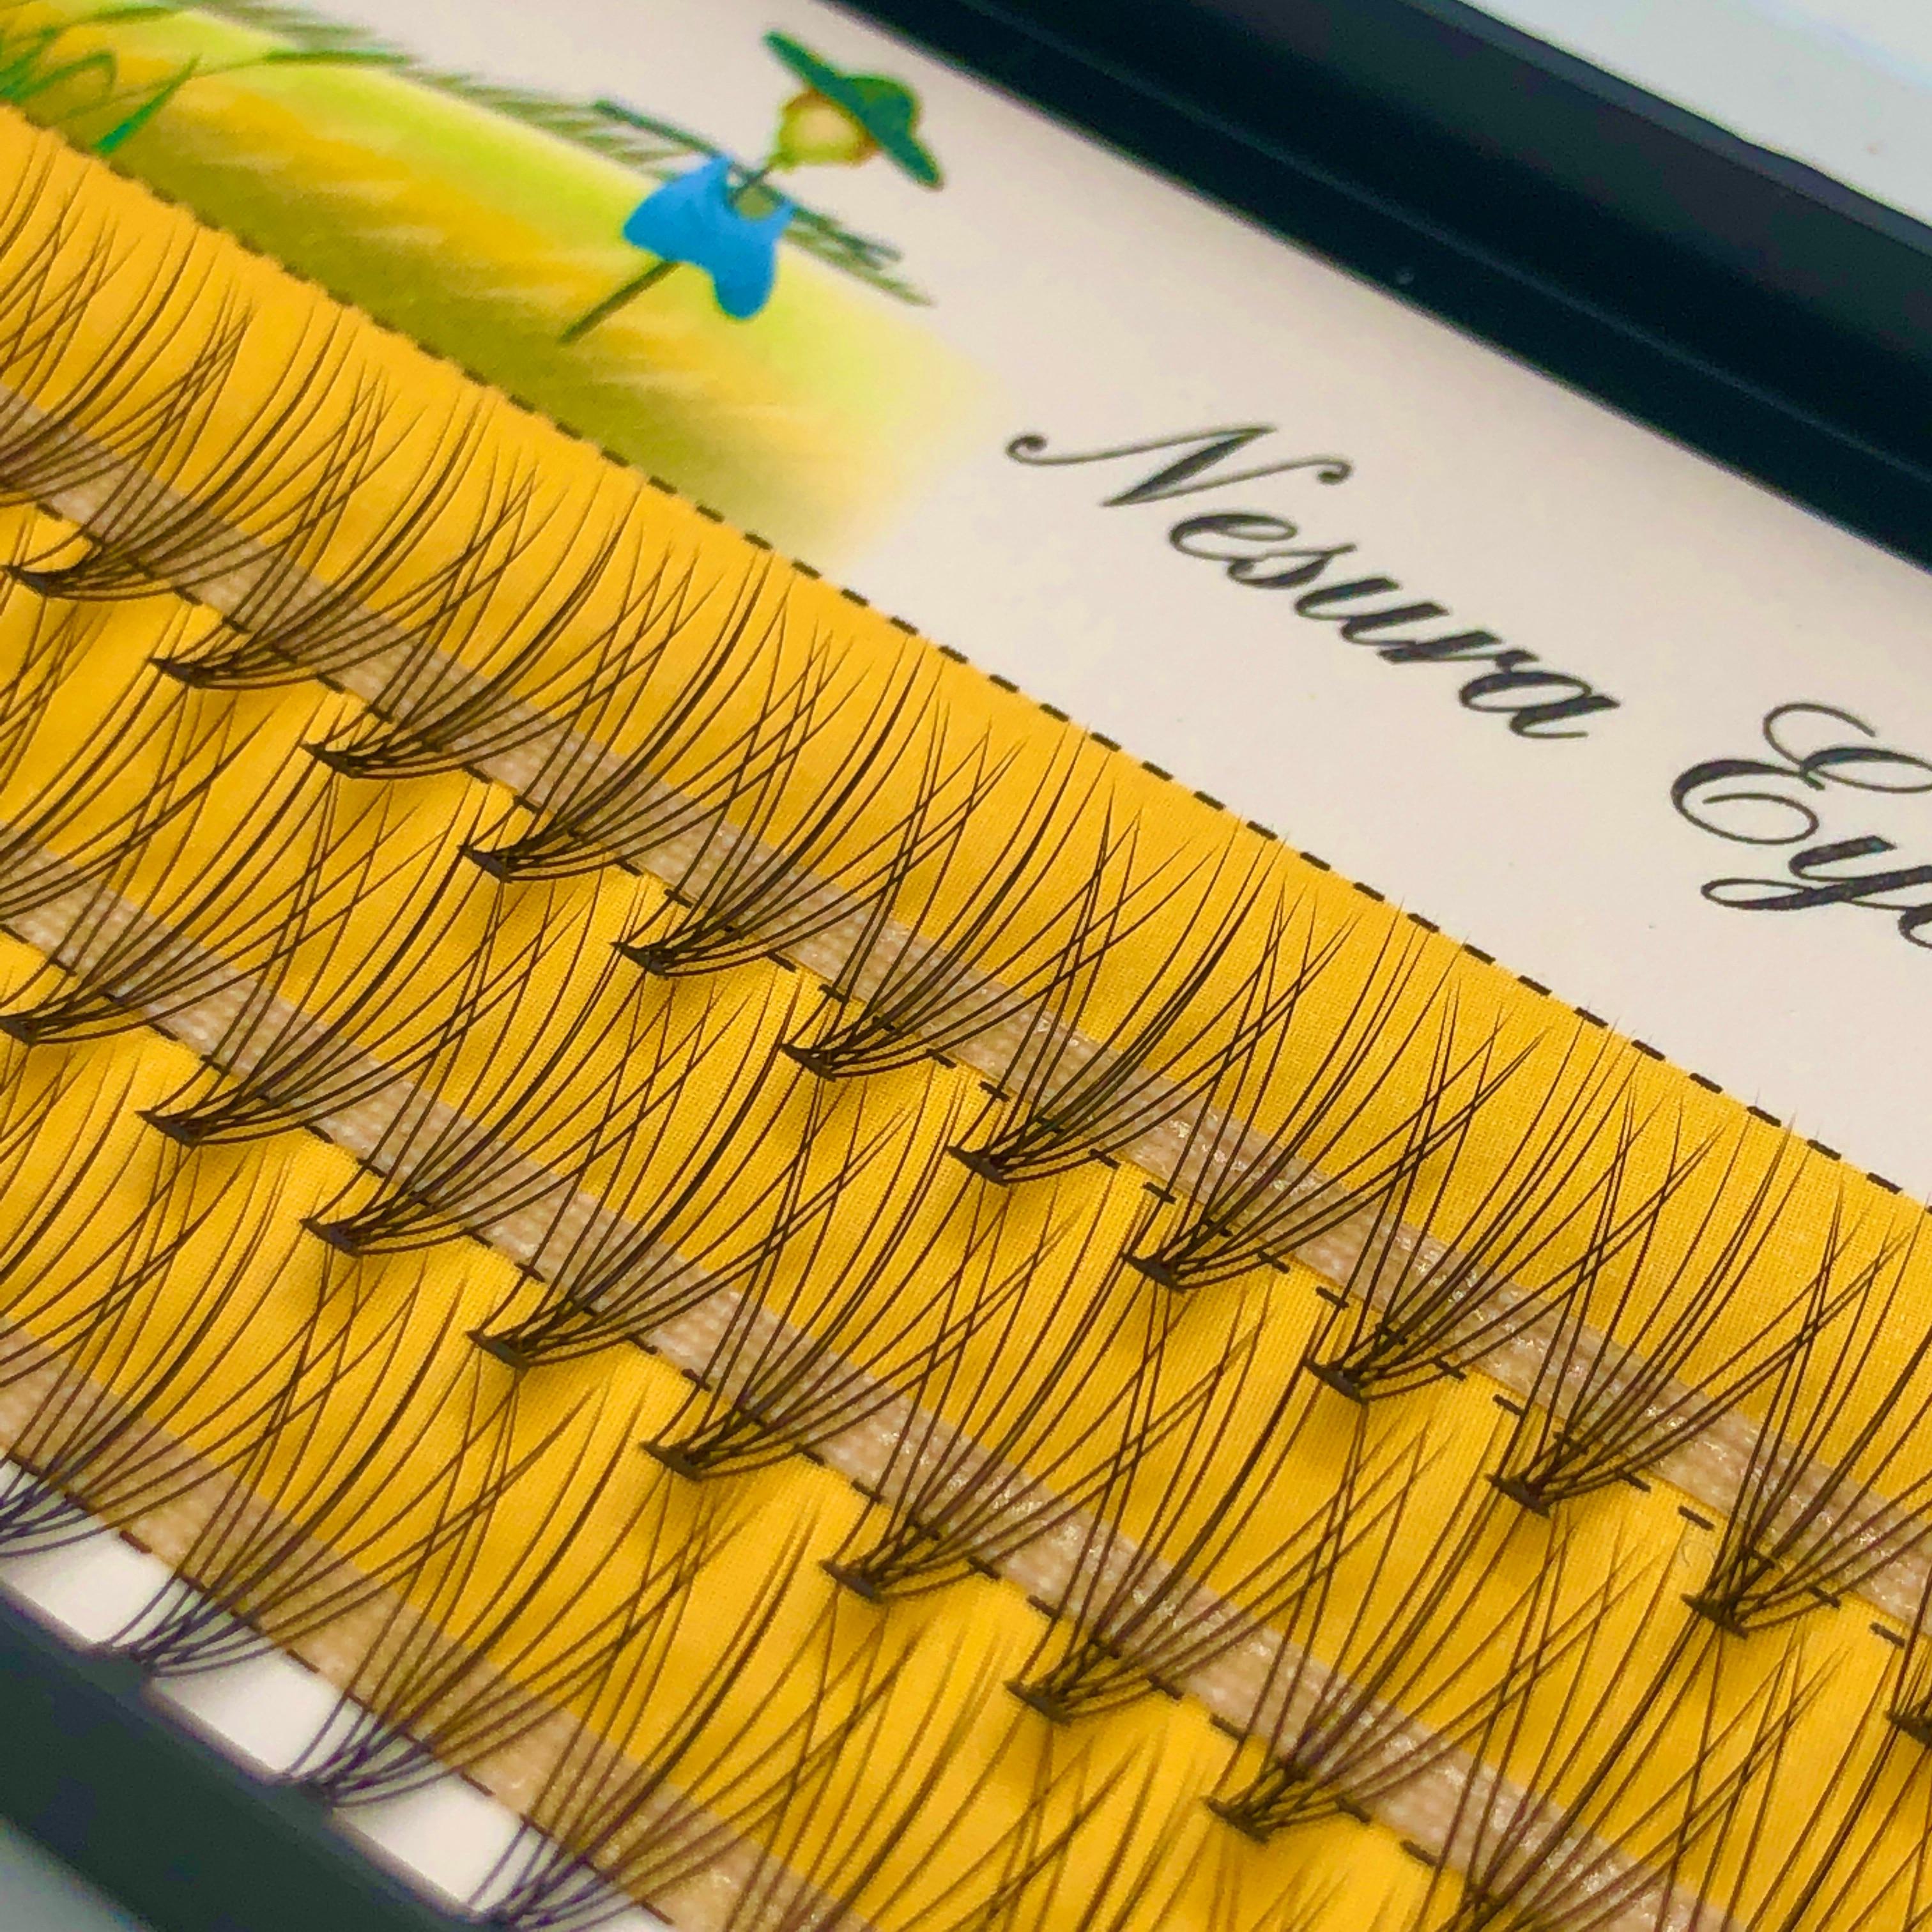 60 Pcs Mink Eyelashes Extension Natural 3D Russian  Volume Faux Eyelashes Individual 10D Cluster Lashes Makeup Cilia